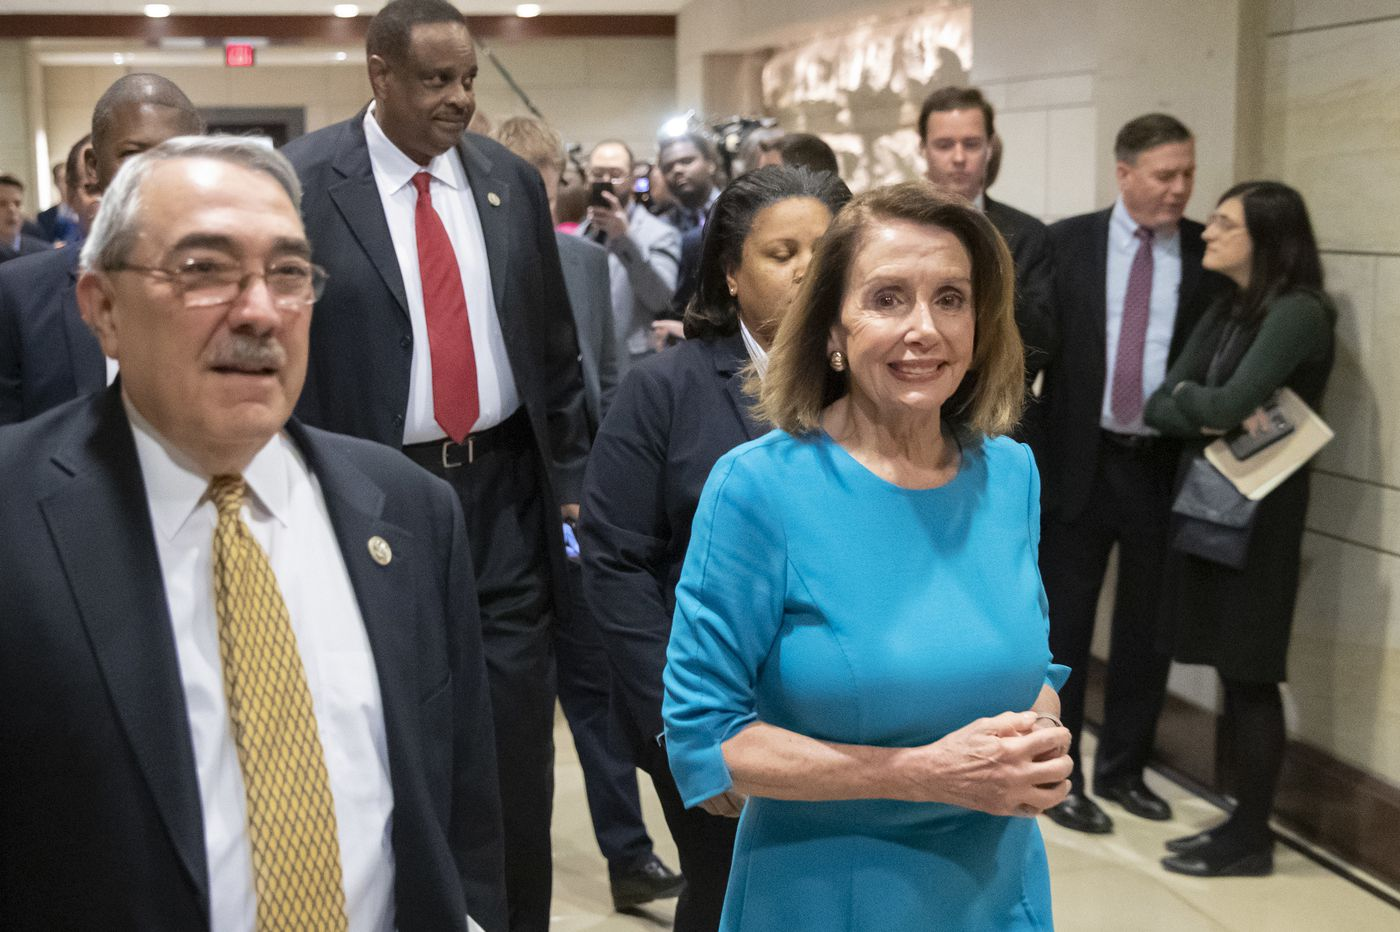 Democrats nominate Rep. Nancy Pelosi for House speaker